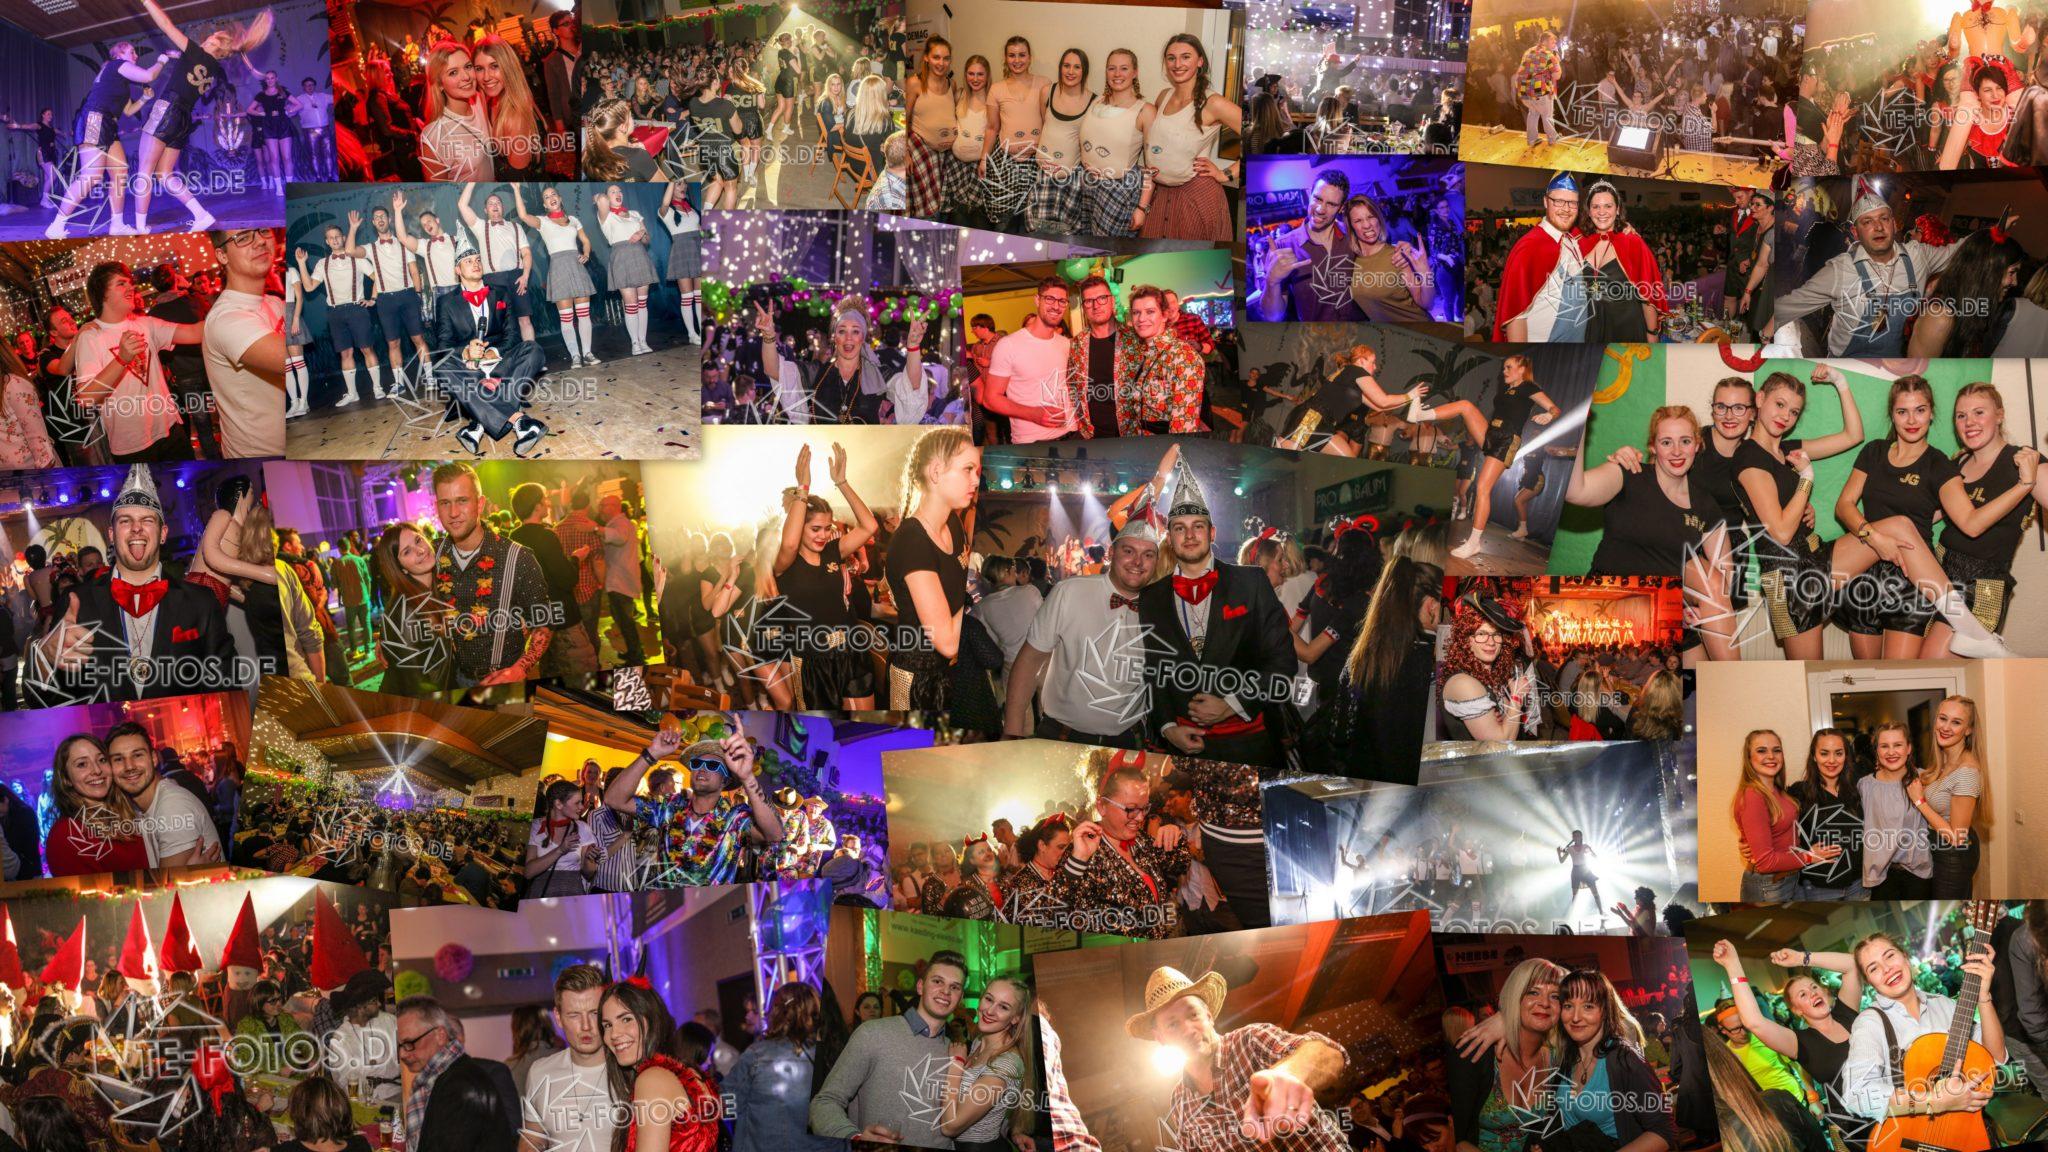 Impressionen vom Schoninger Karneval in Vernawahlshausen - Samstag